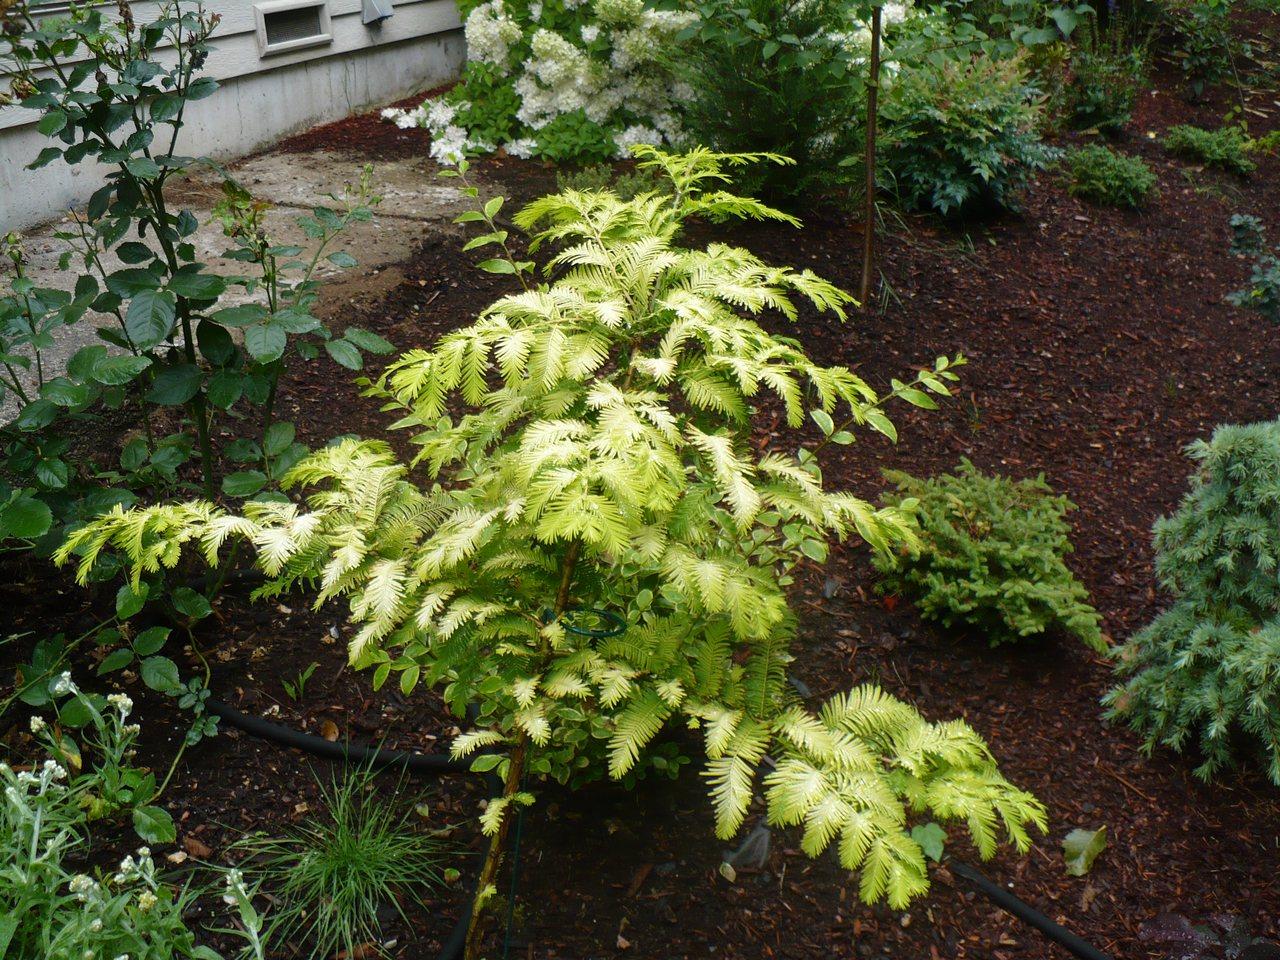 Metasequoia glyptostroboides Ogon Gold Rush Dawn Redwood deciduous conifer fast growing pyramidal gold yellow foliage